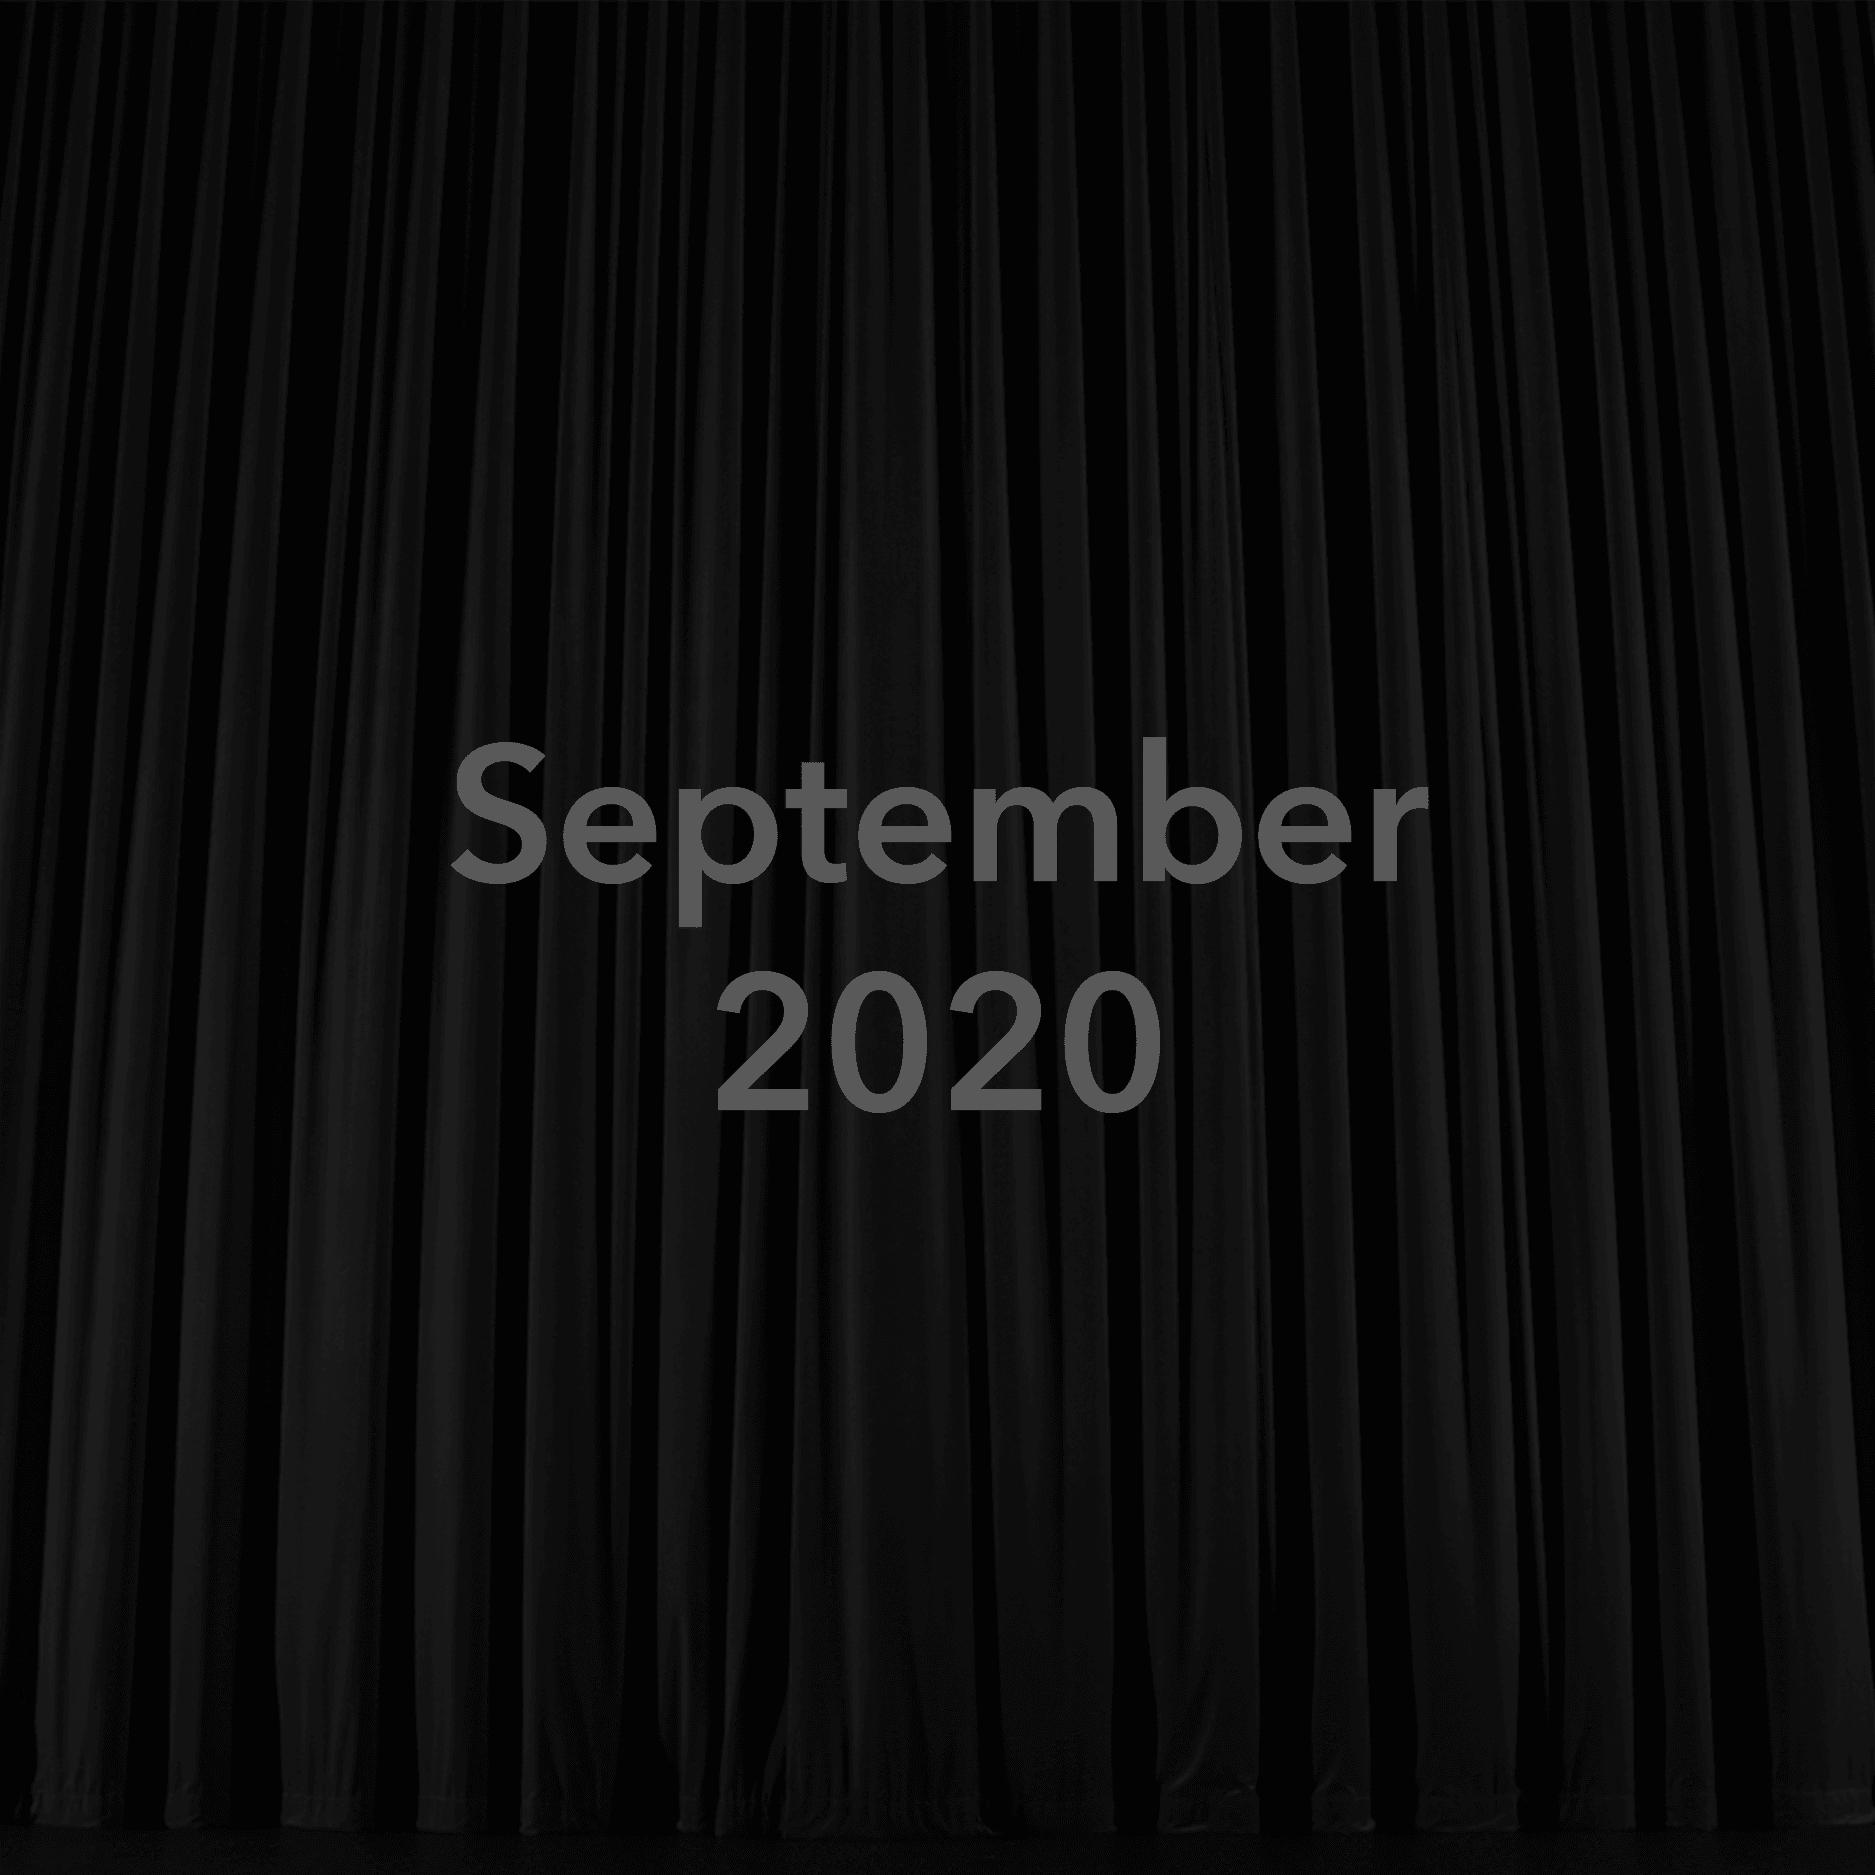 Sept 2020 Show Placeholder